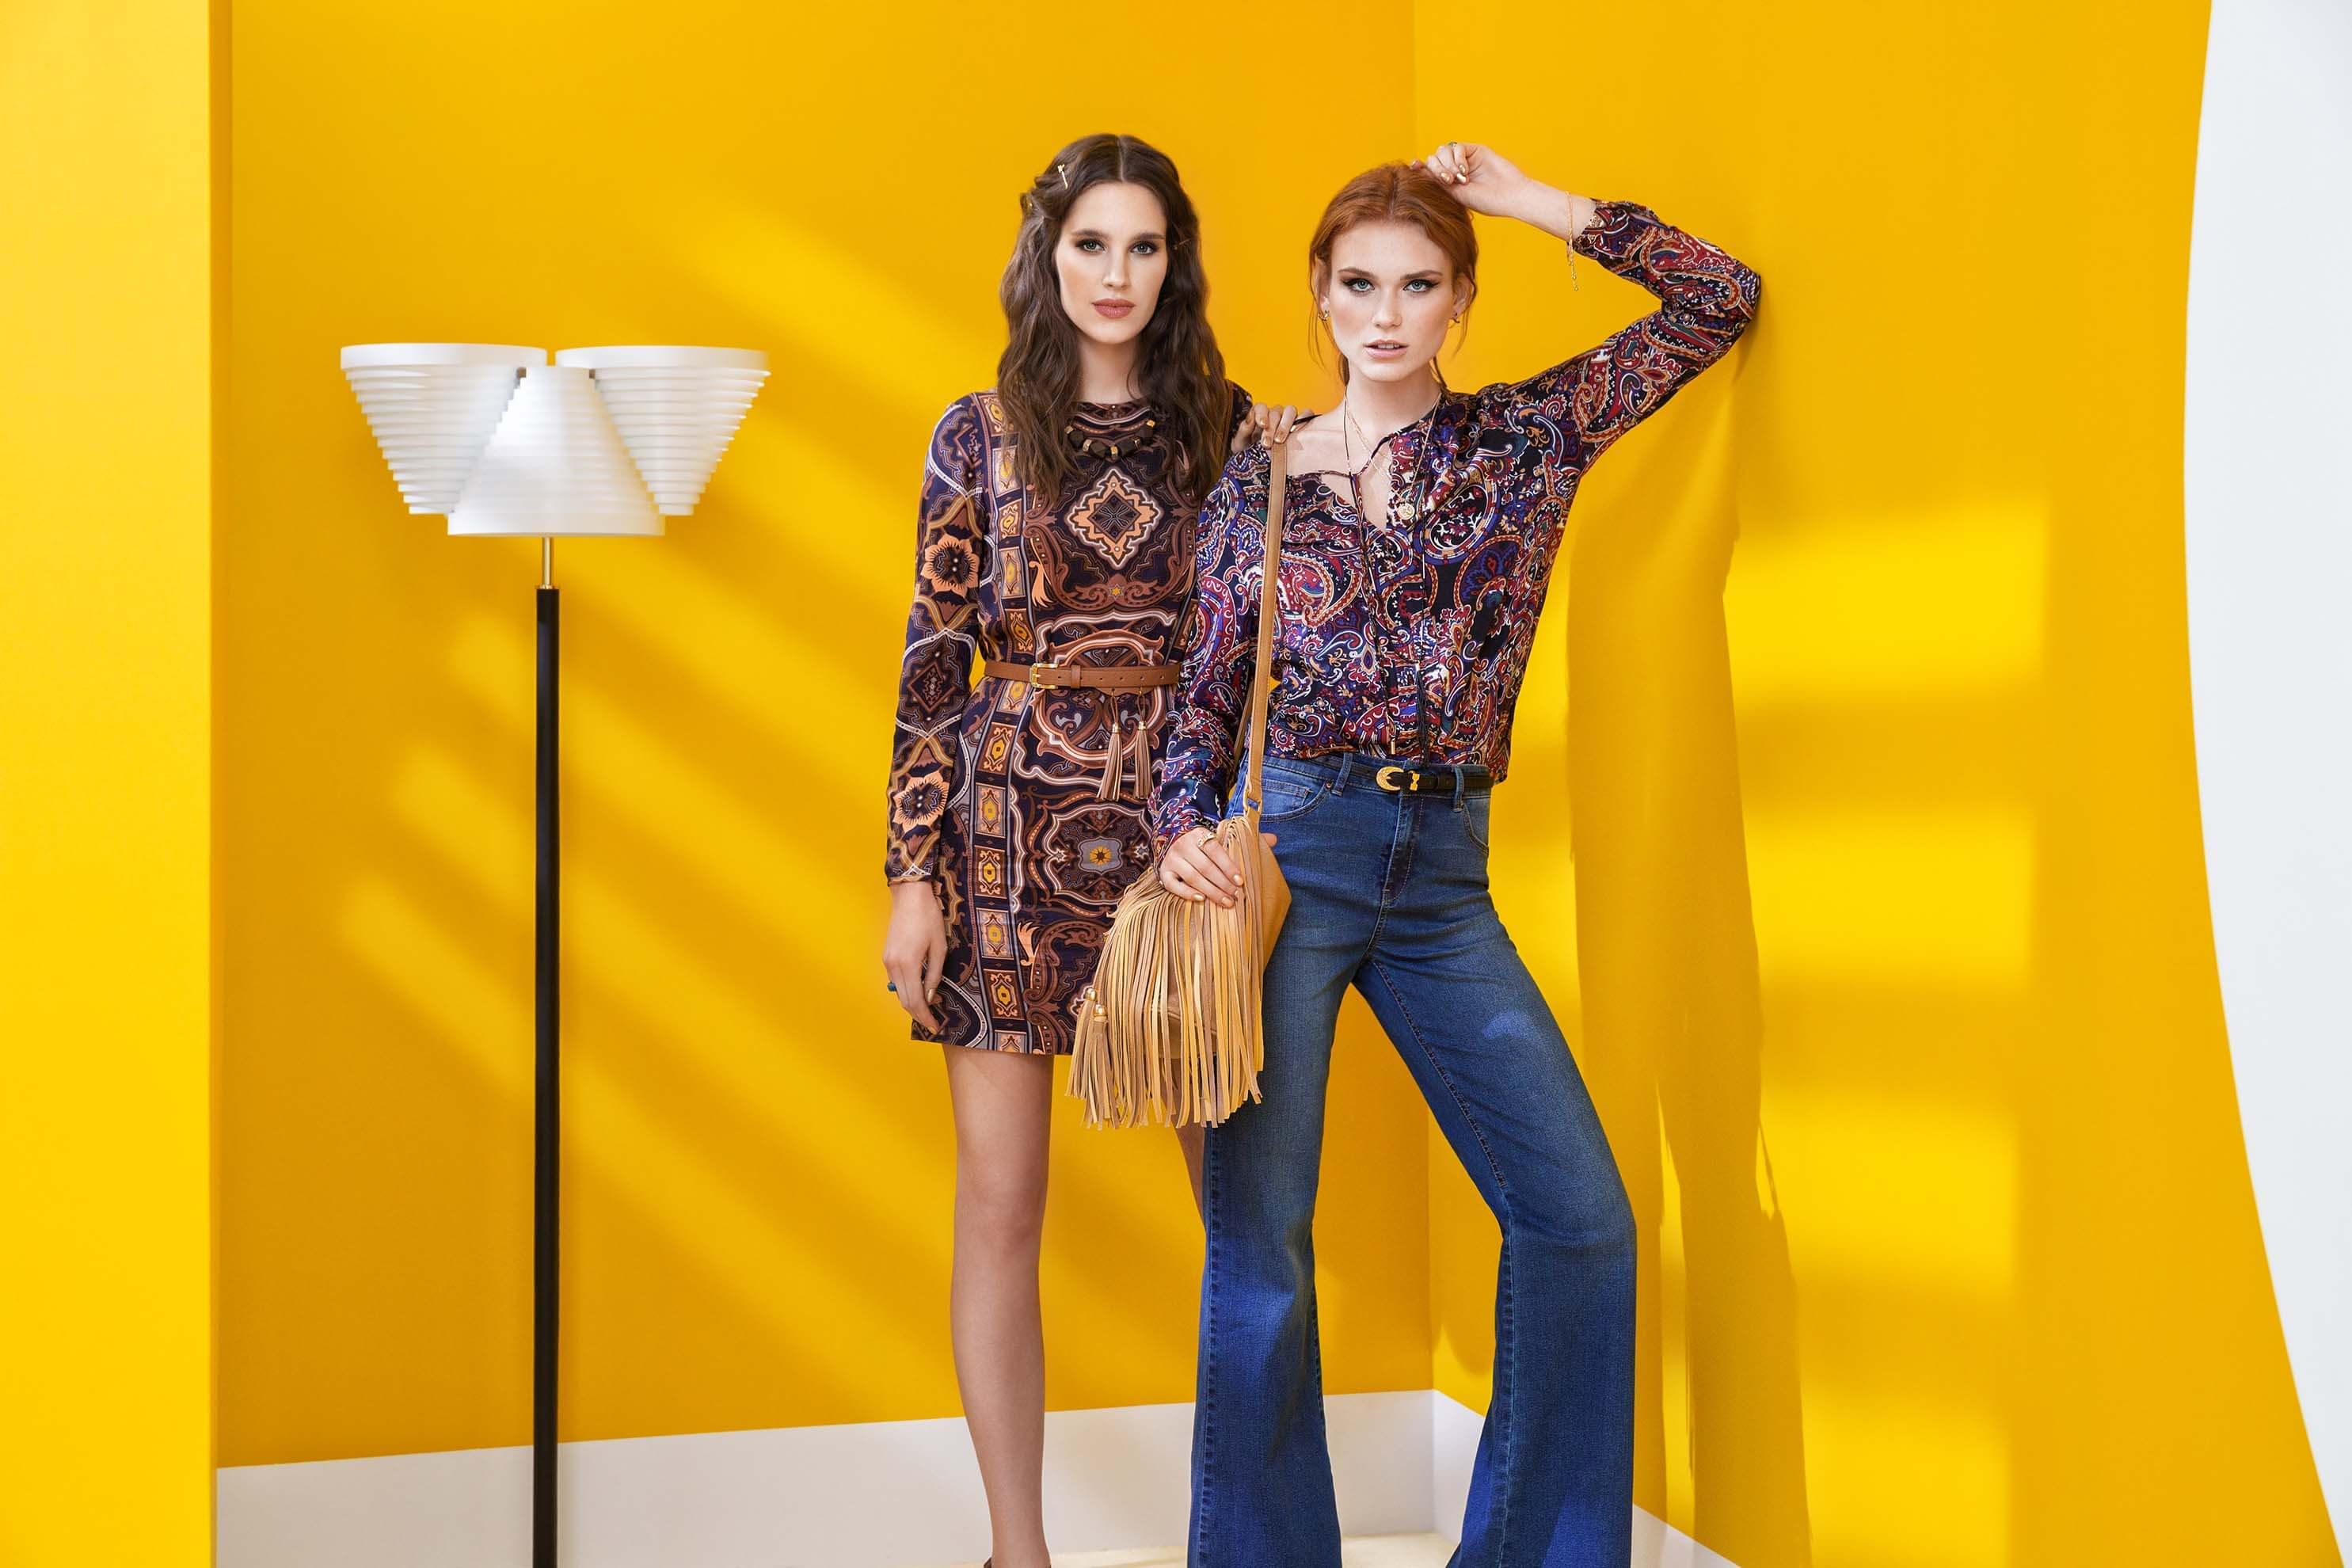 ЕВГЕНИЯ ВОРОНОВА – Concept Club Campaign SS'16 – EVGENIA VORONOVA